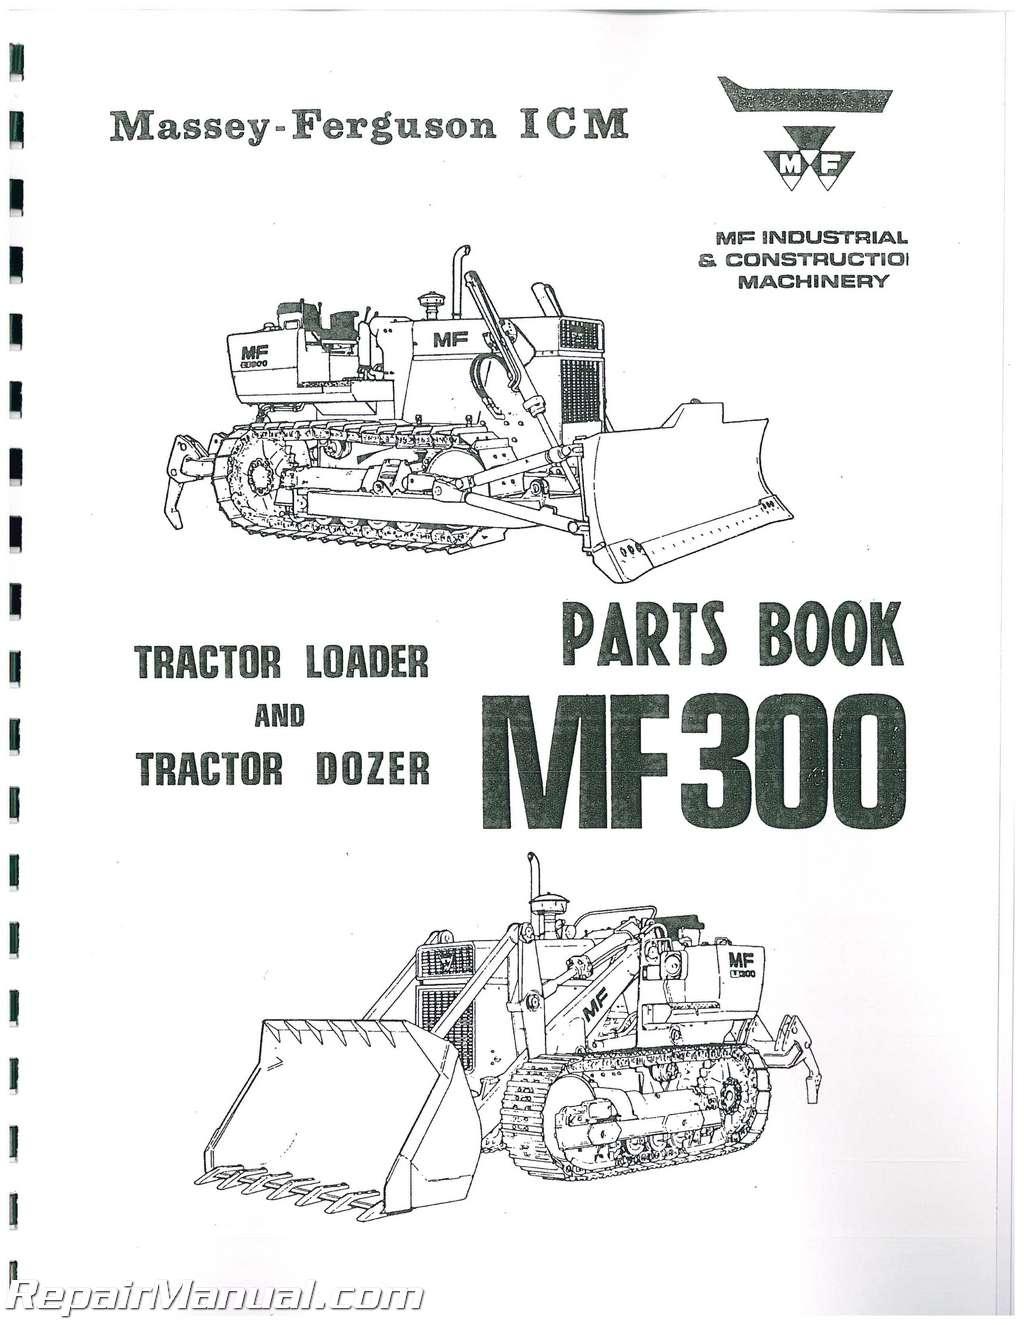 Massey Ferguson Repair Parts : Massey ferguson crawler parts manual